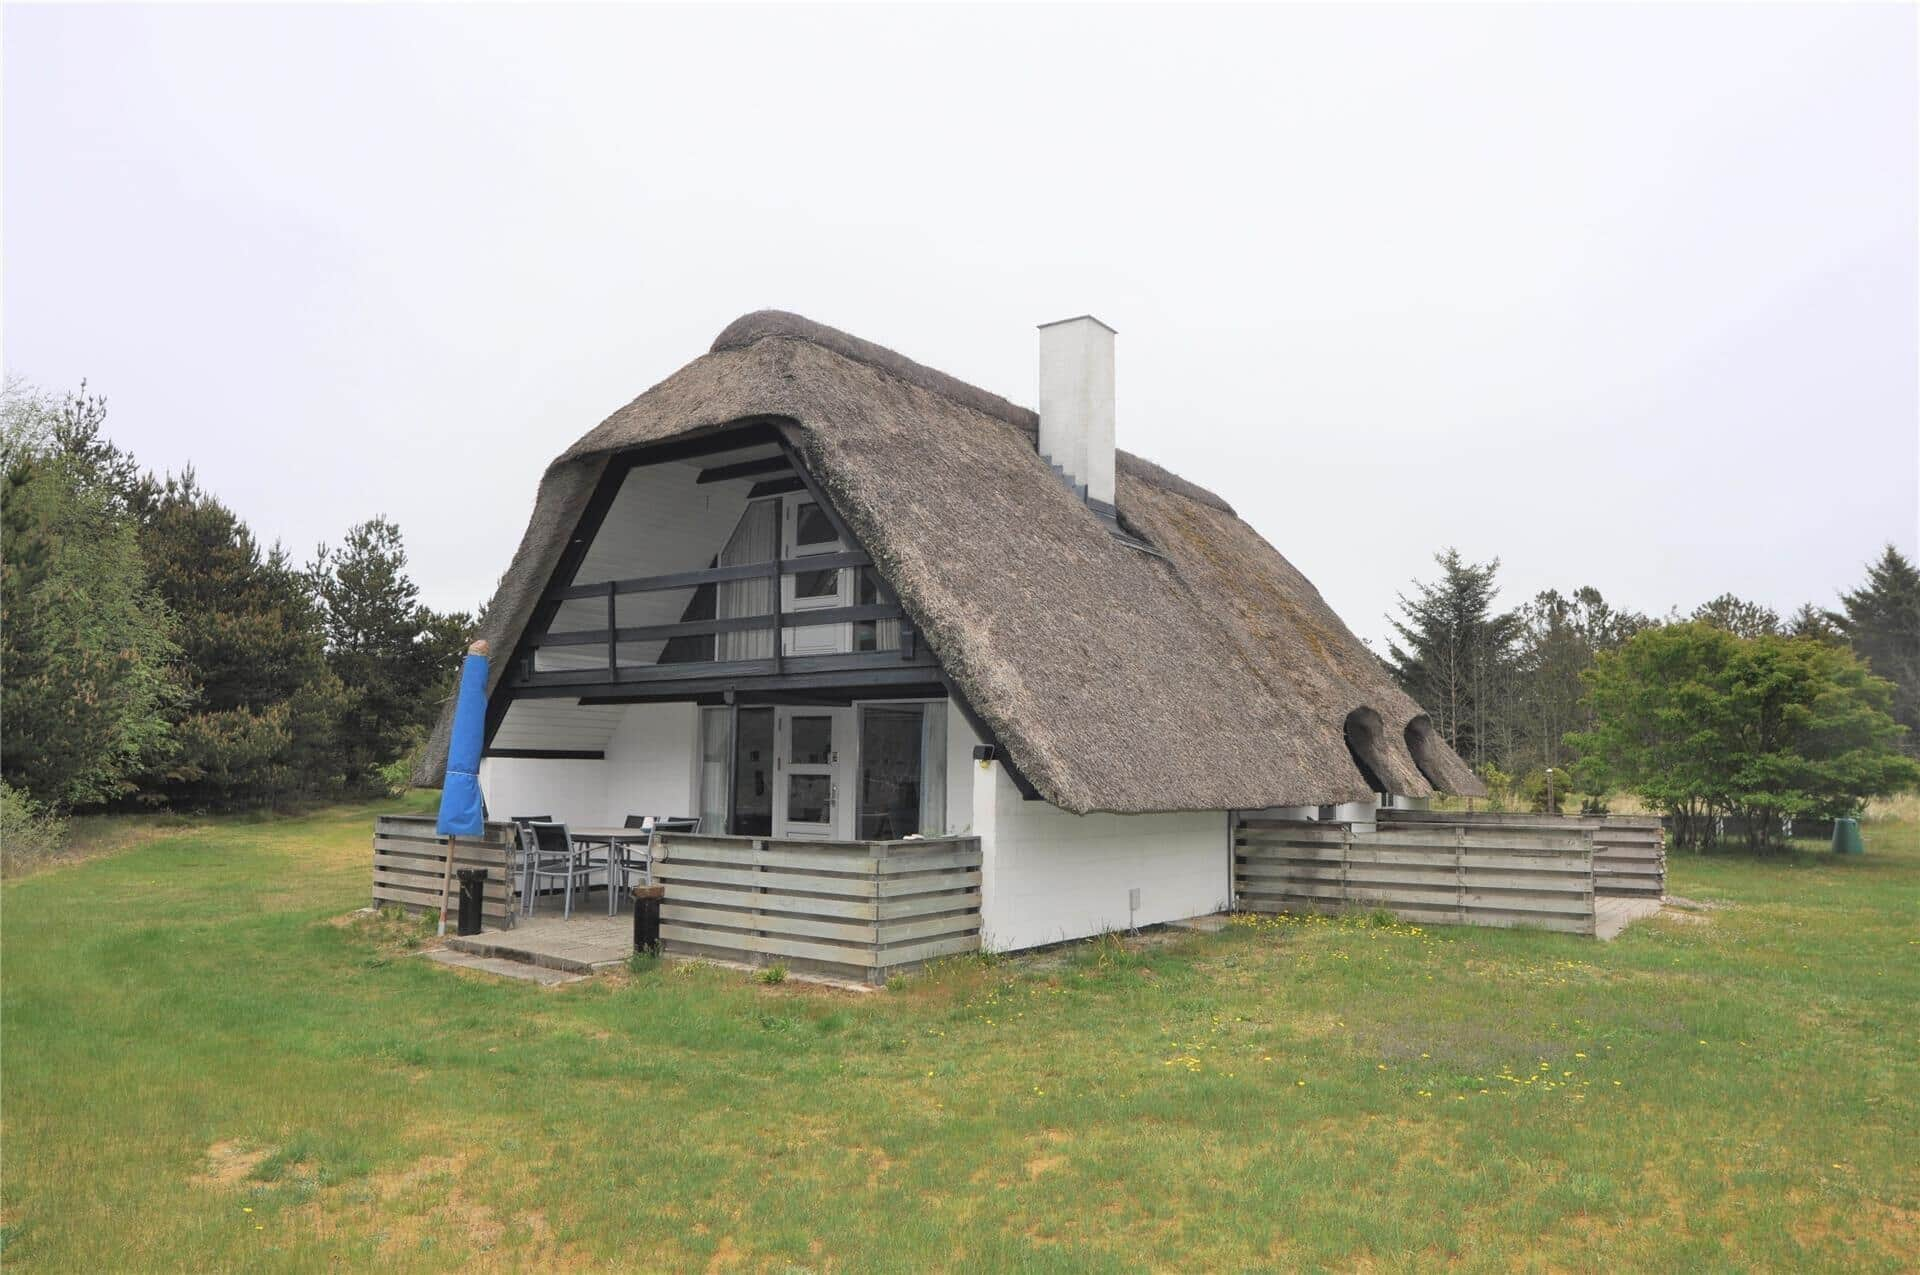 Billede 1-175 Sommerhus 10296, Gaffelbjergvej 22, DK - 6990 Ulfborg